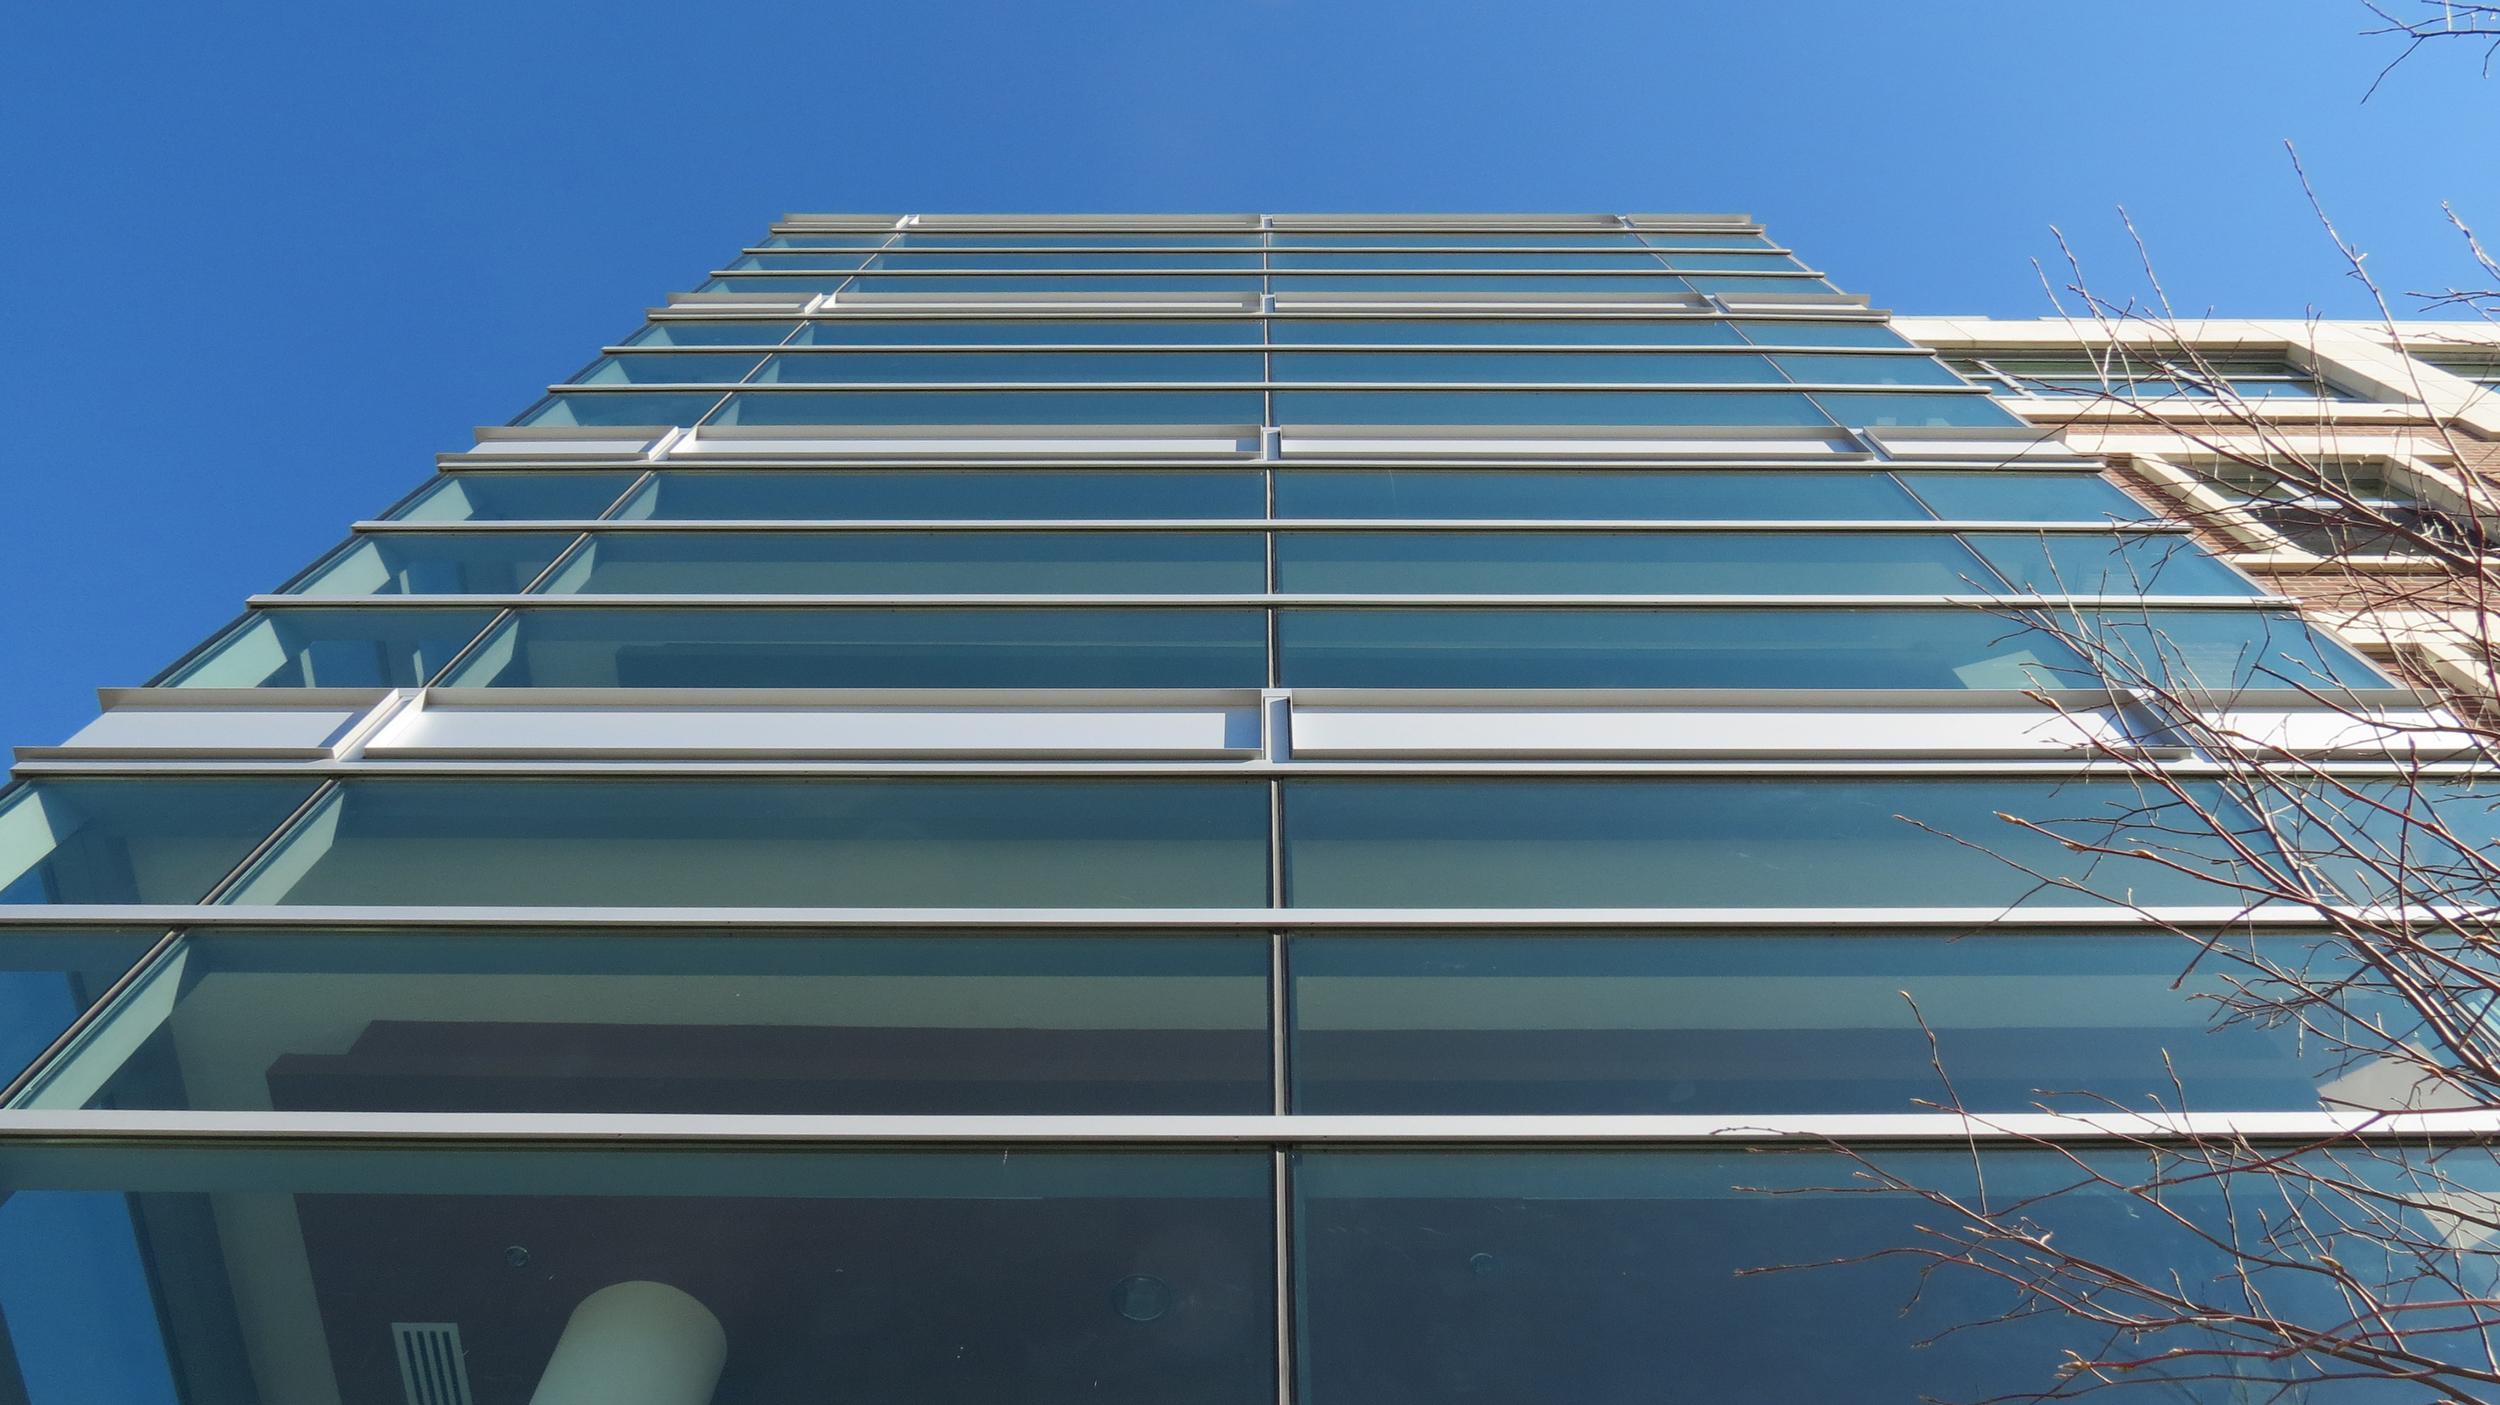 university_of_illinois_urbana_champaign_nugent_hall_ikenberry_commons_glass_detail.jpg